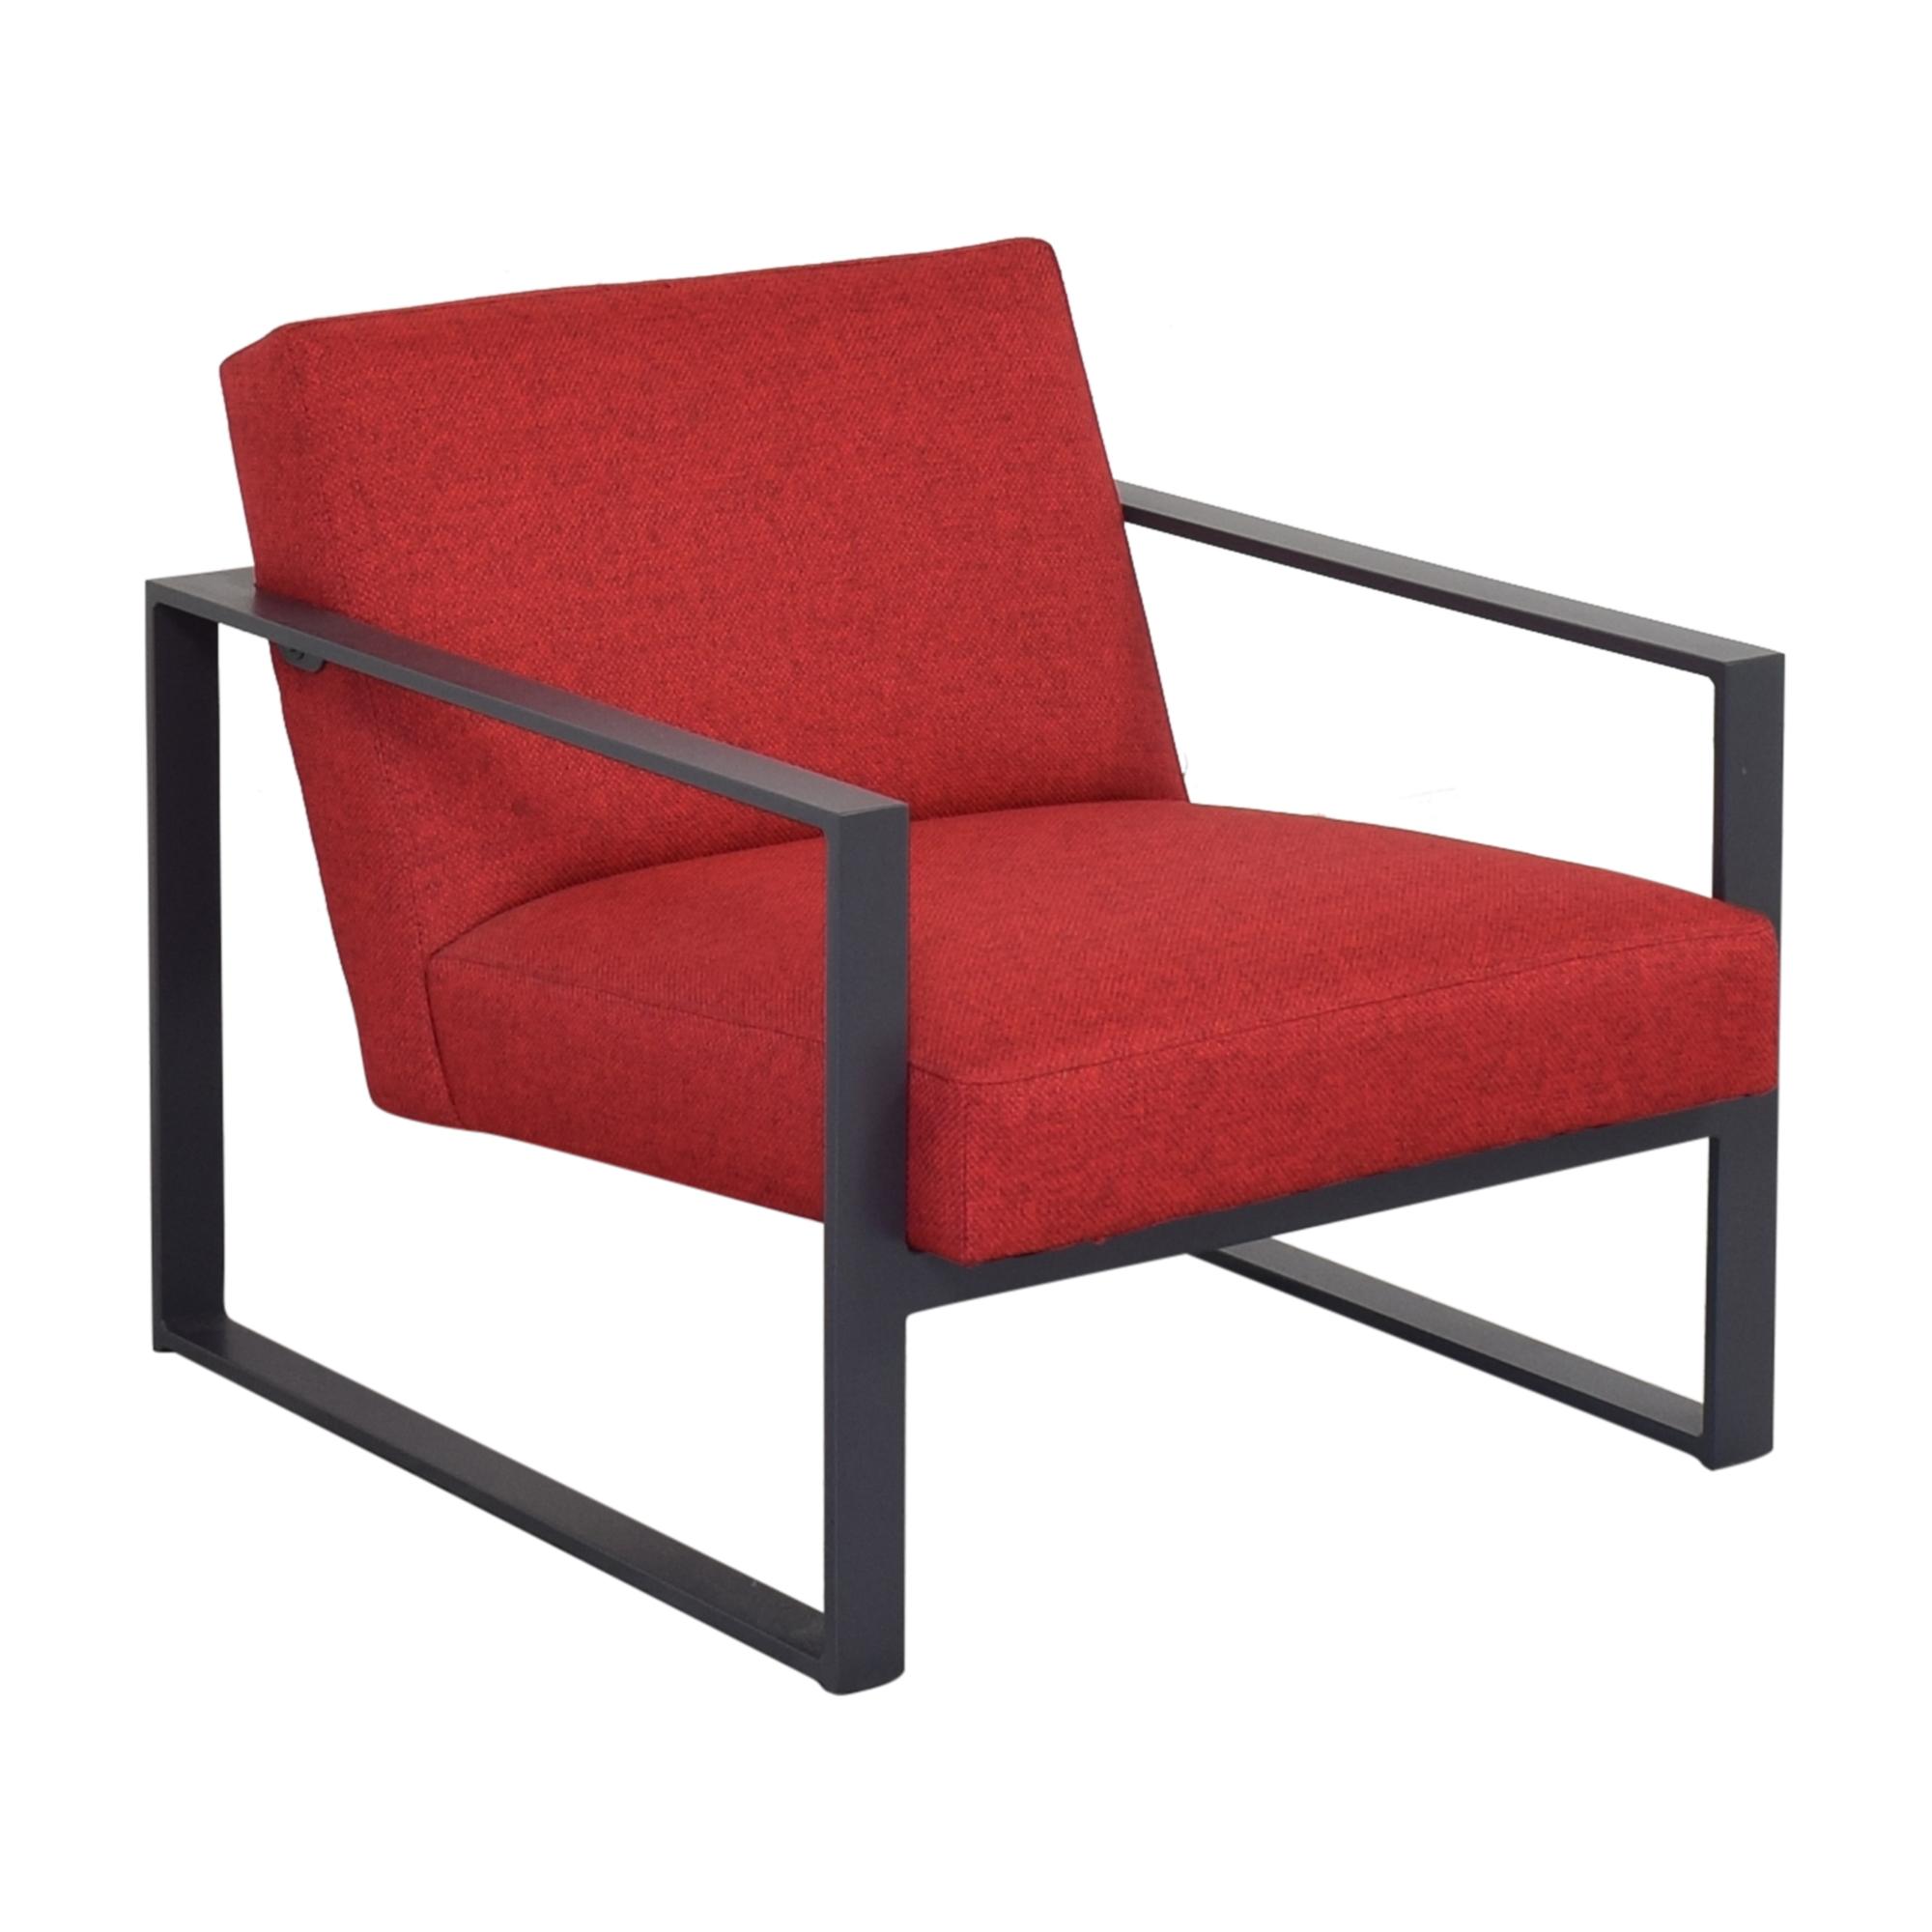 Crate & Barrel Crate & Barrel Specs Chair on sale